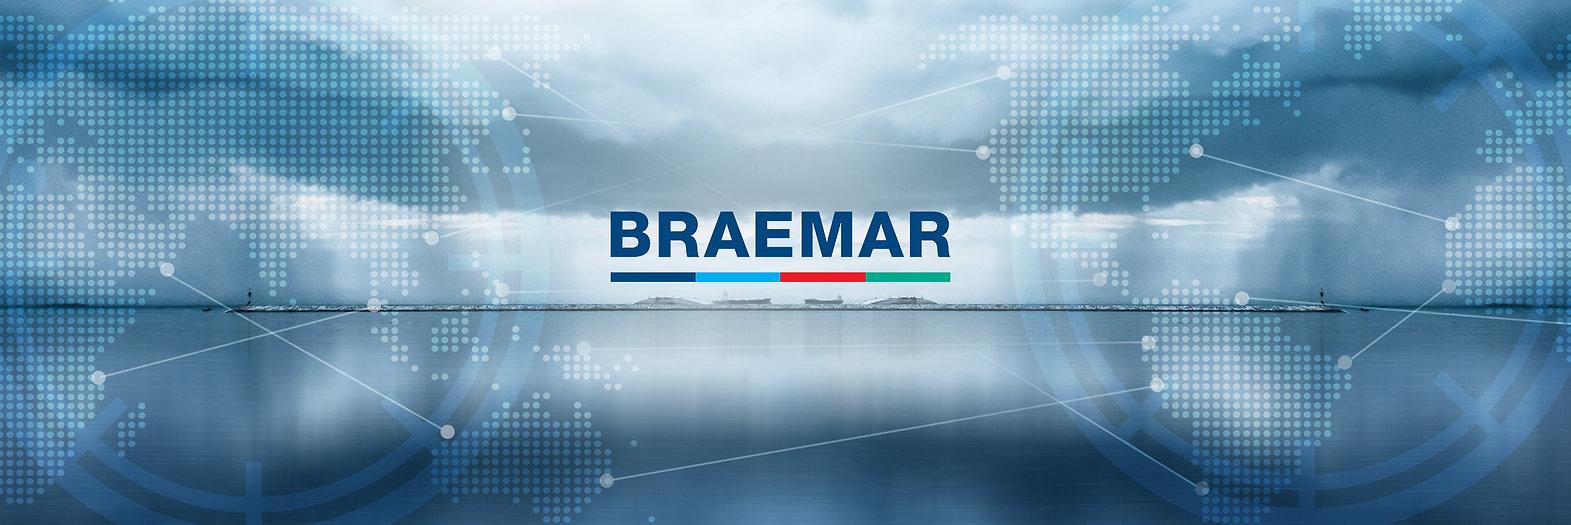 braemar_title.jpg